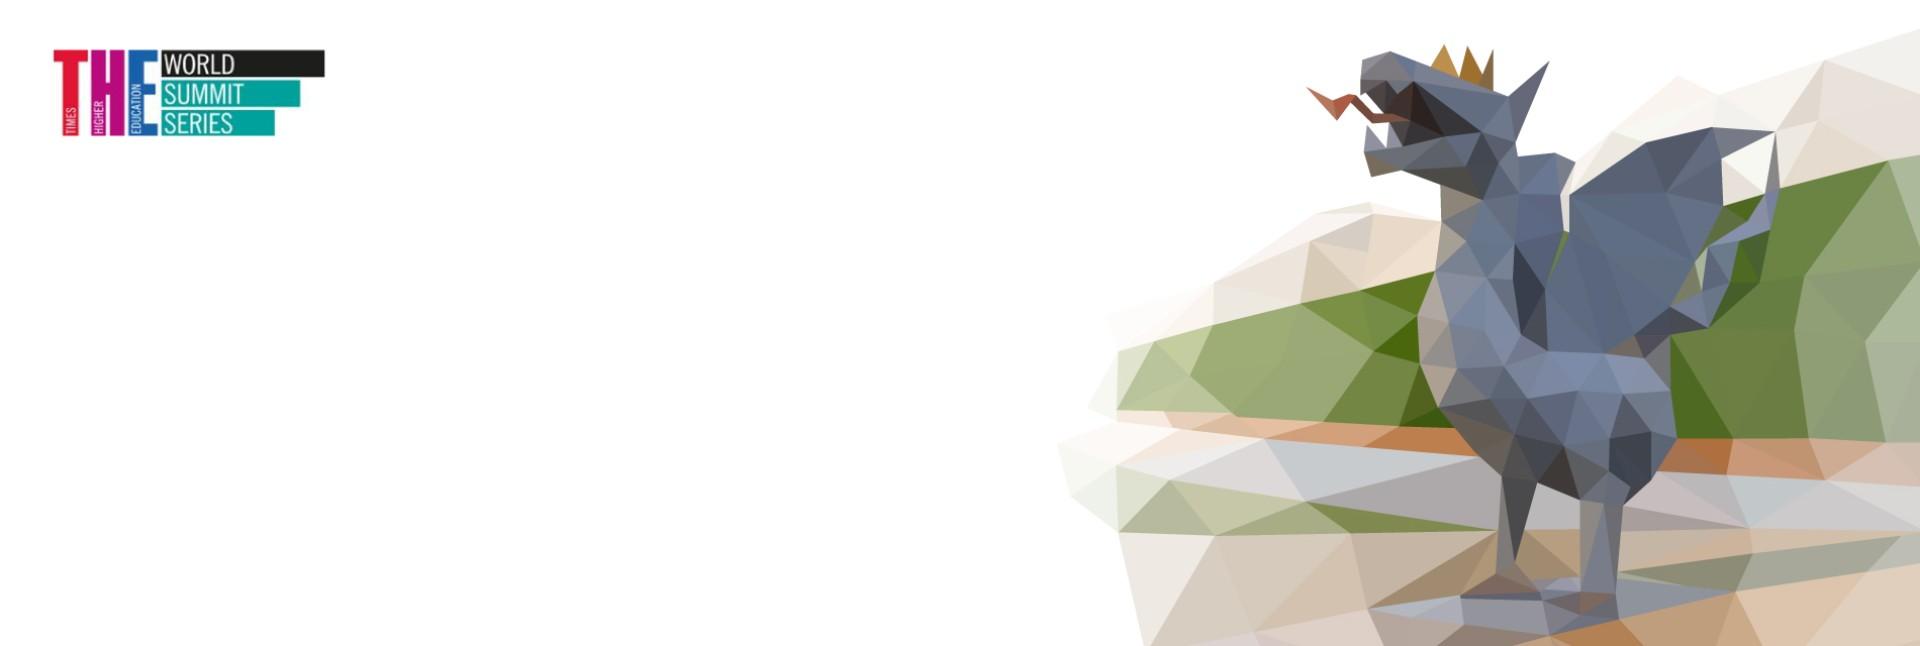 Саммит THE Research Excellence Summit: Eurasia 2018 пройдет в КФУ